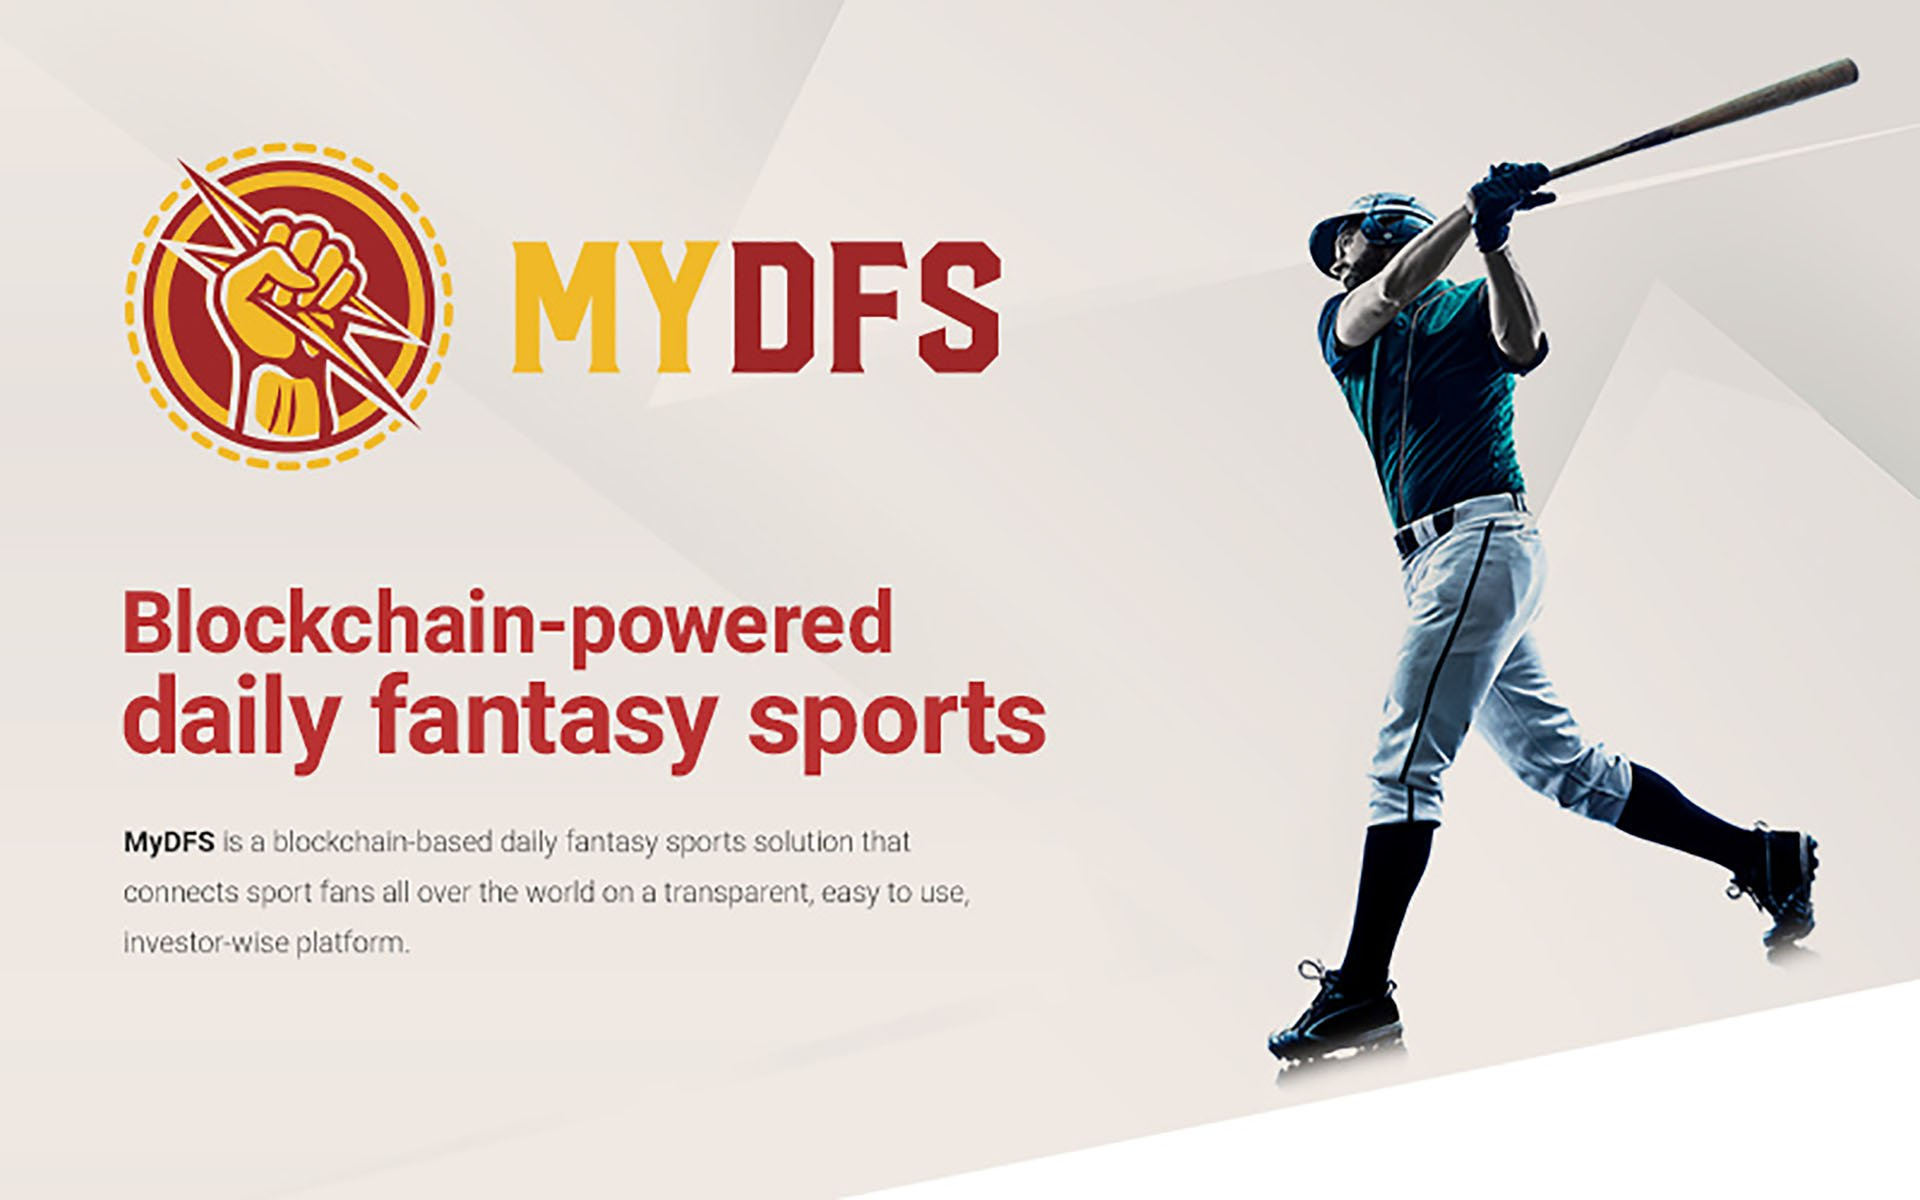 Creators of uTrener and KHL Fantasy Sport Apps Introduce Blockchain Powered Daily Fantasy Sports Platform MyDFS